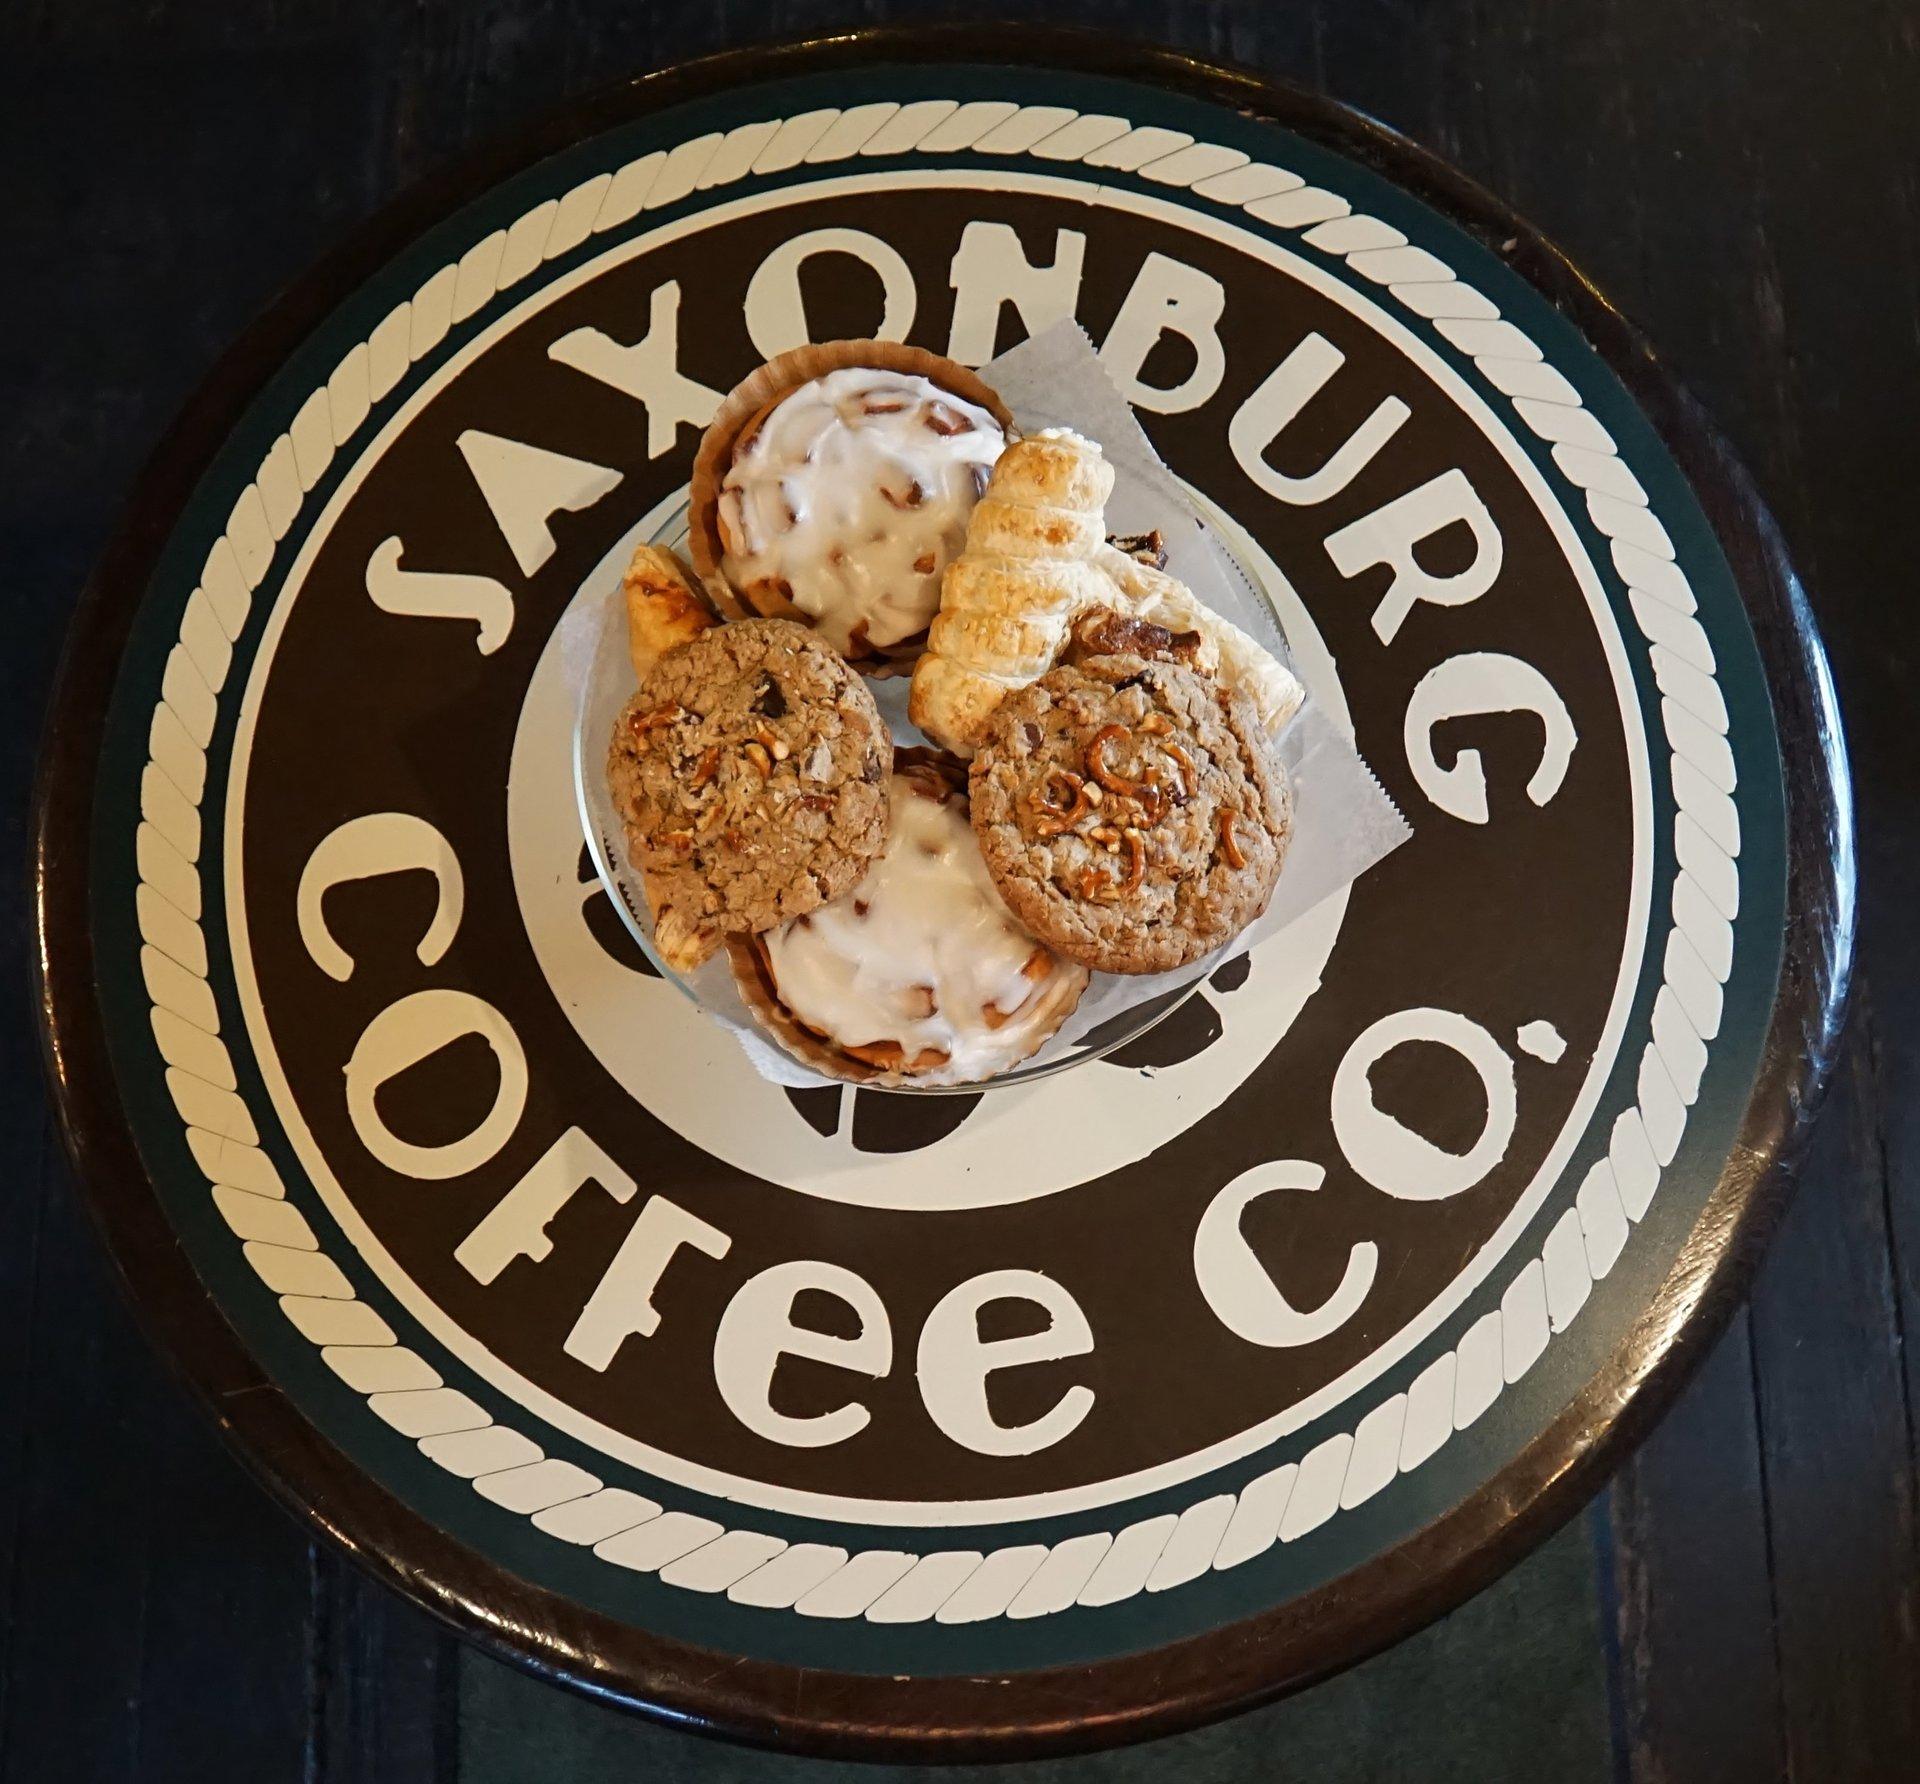 Saxonburg Coffee & Tea image 7